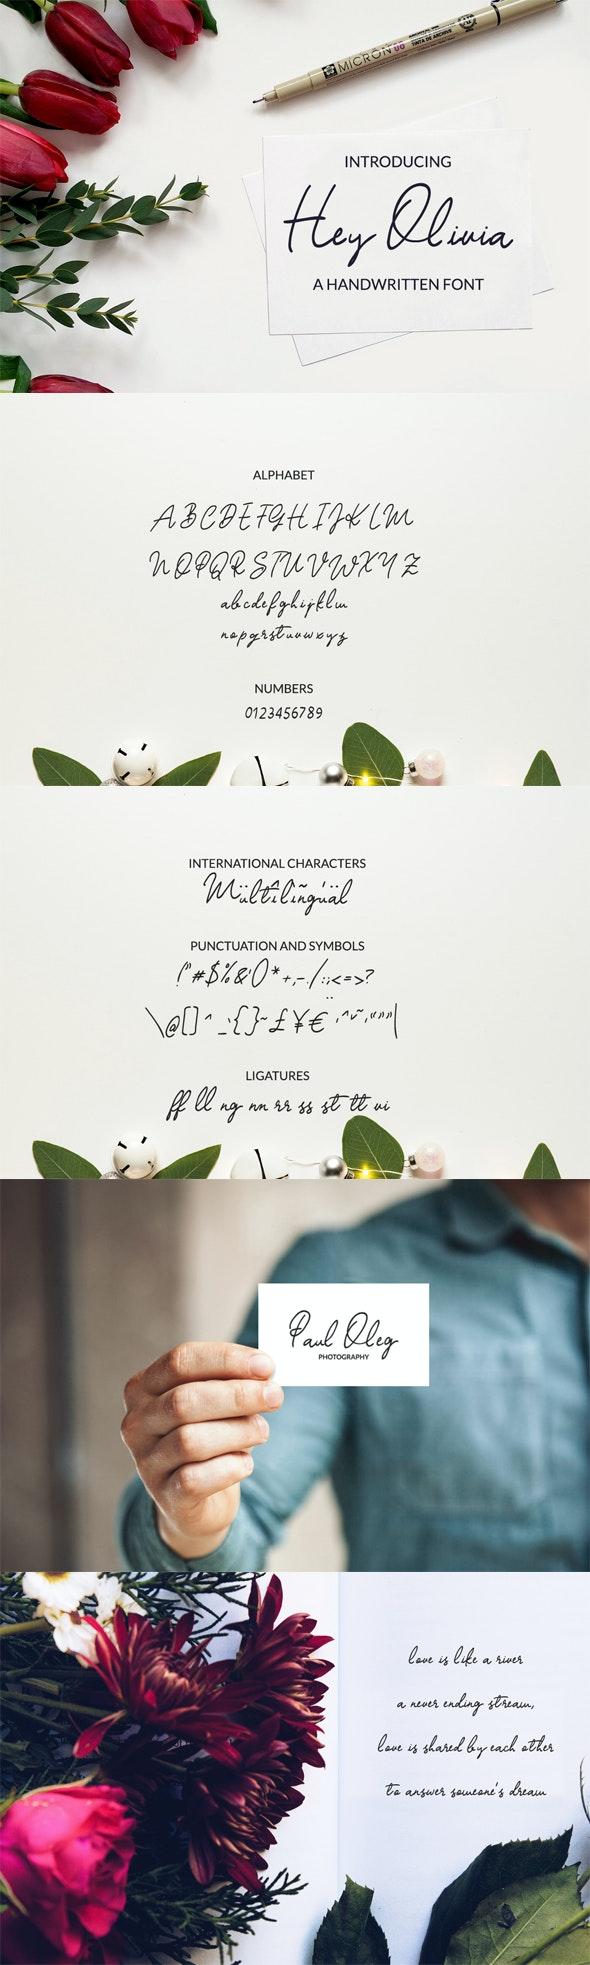 Hey Olivia Handwritten Font - Hand-writing Script